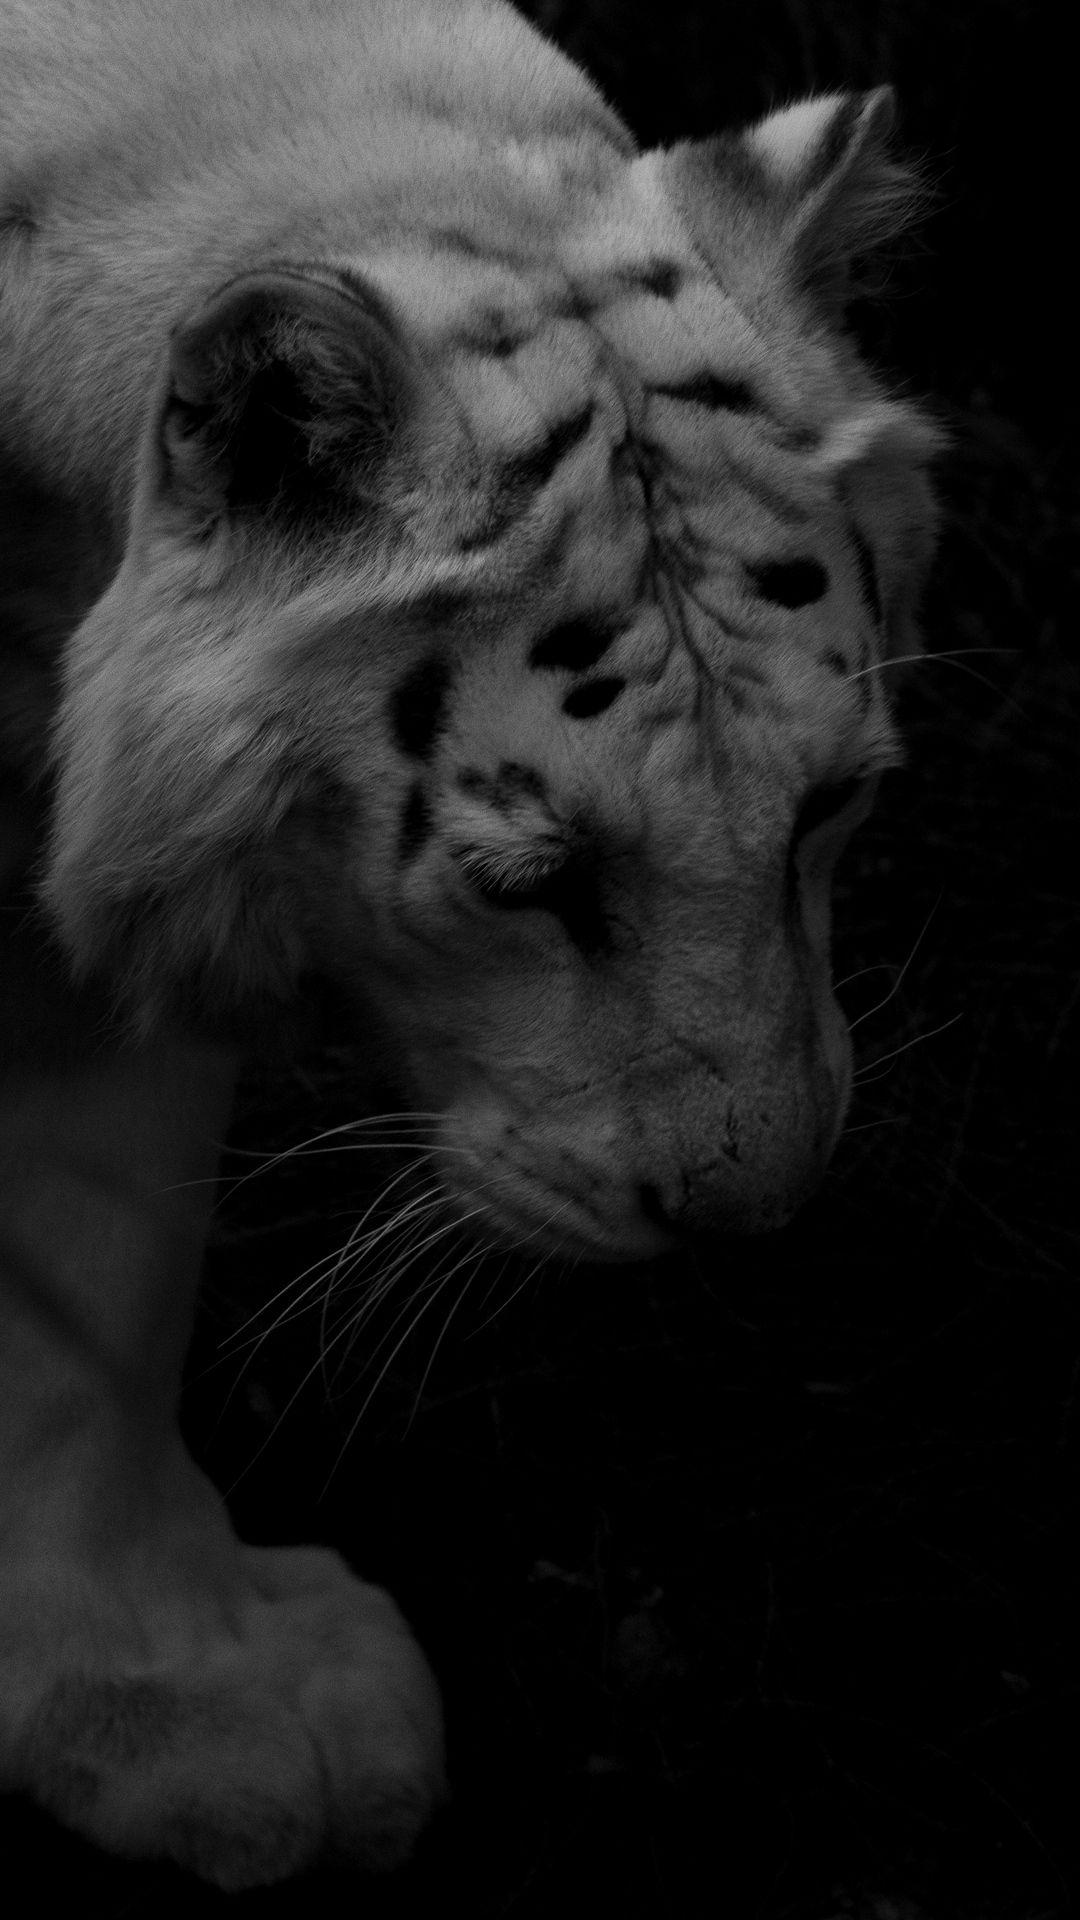 Black And White Tiger Wallpaper Mobile Tiger Wallpaper Iphone Wallpaper Images Animal Wallpaper